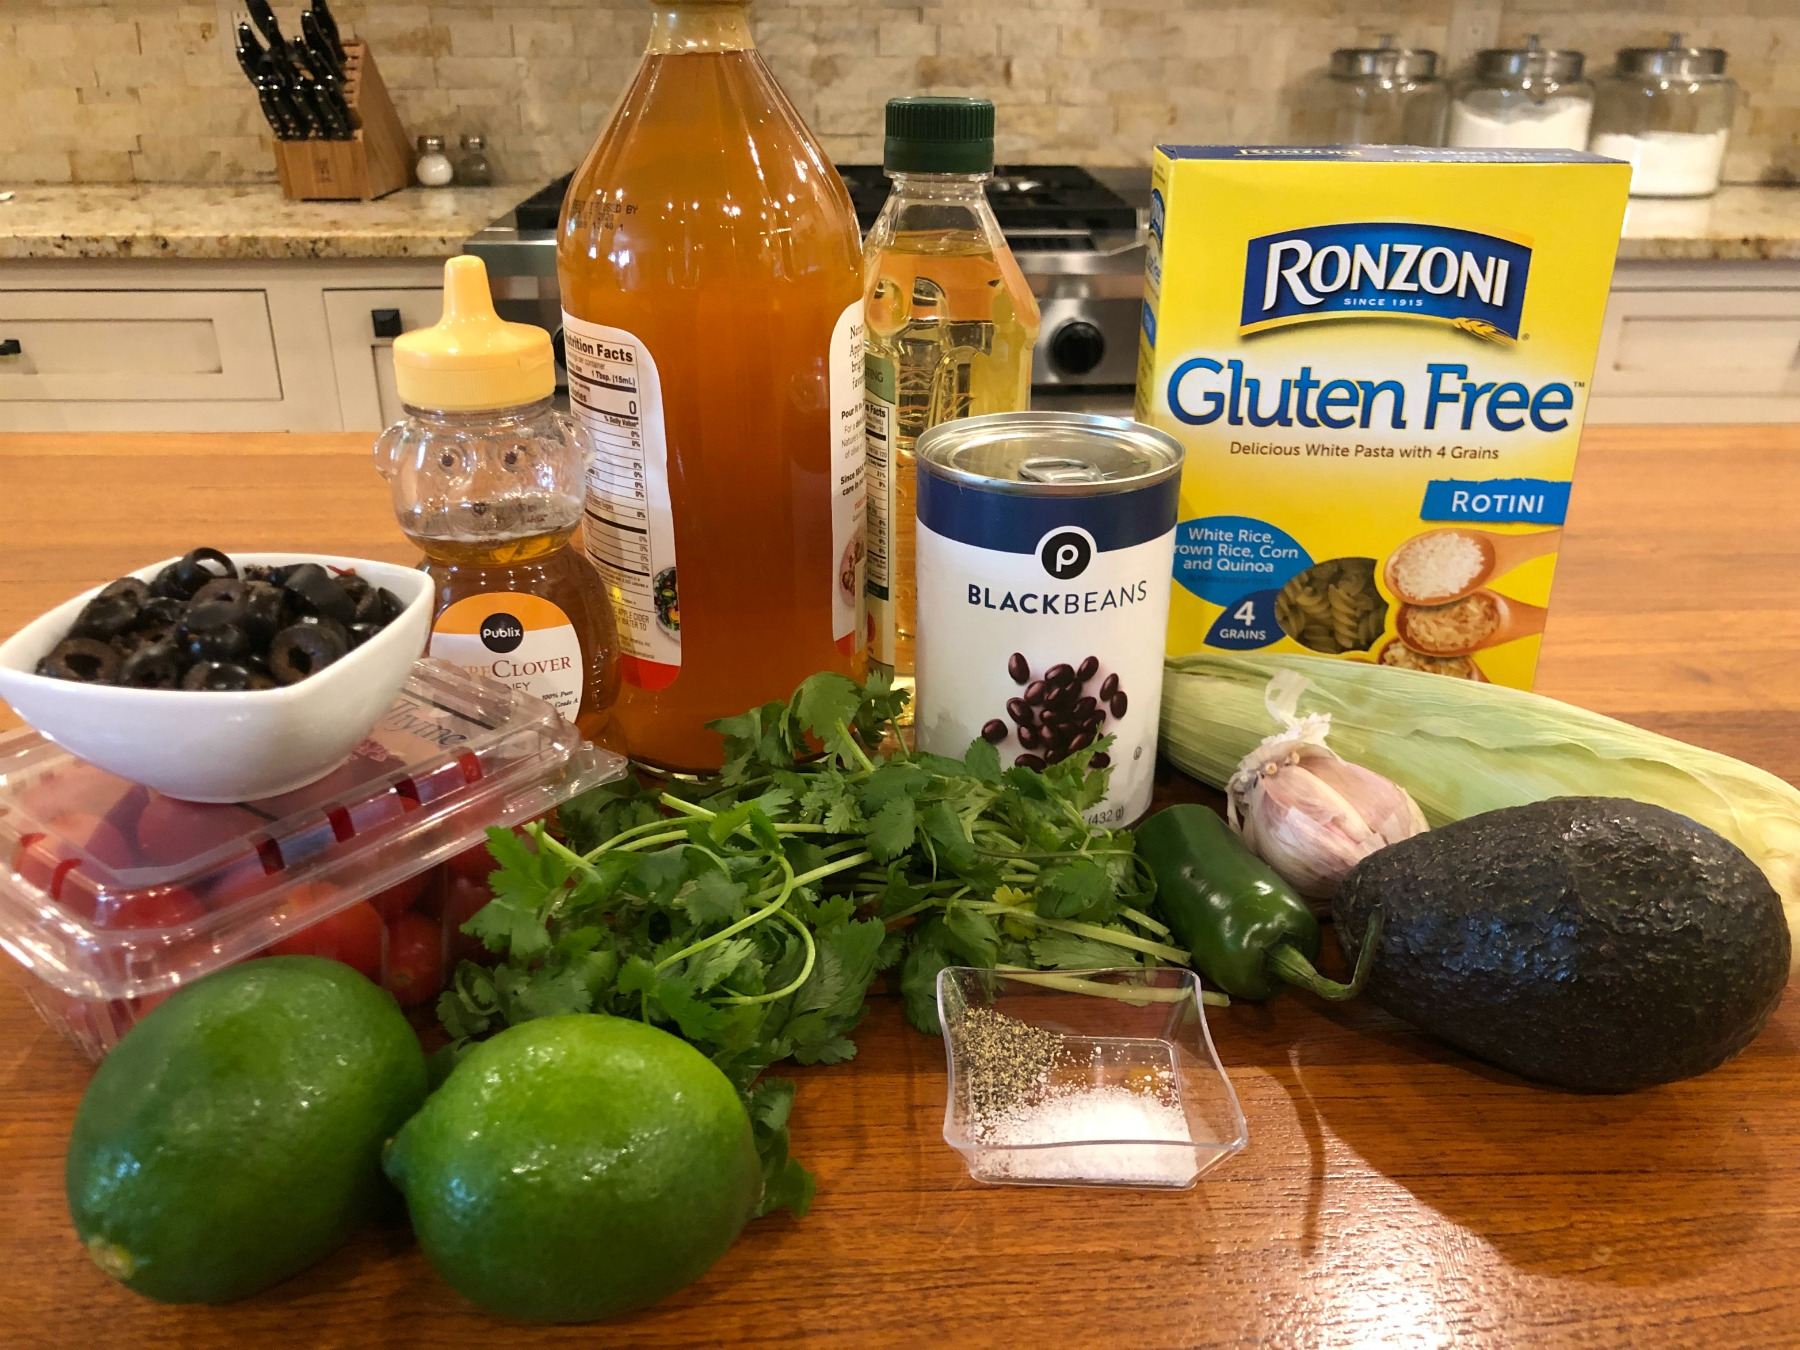 Gluten Free Lime Cilantro Southwestern Pasta Salad on I Heart Publix 4